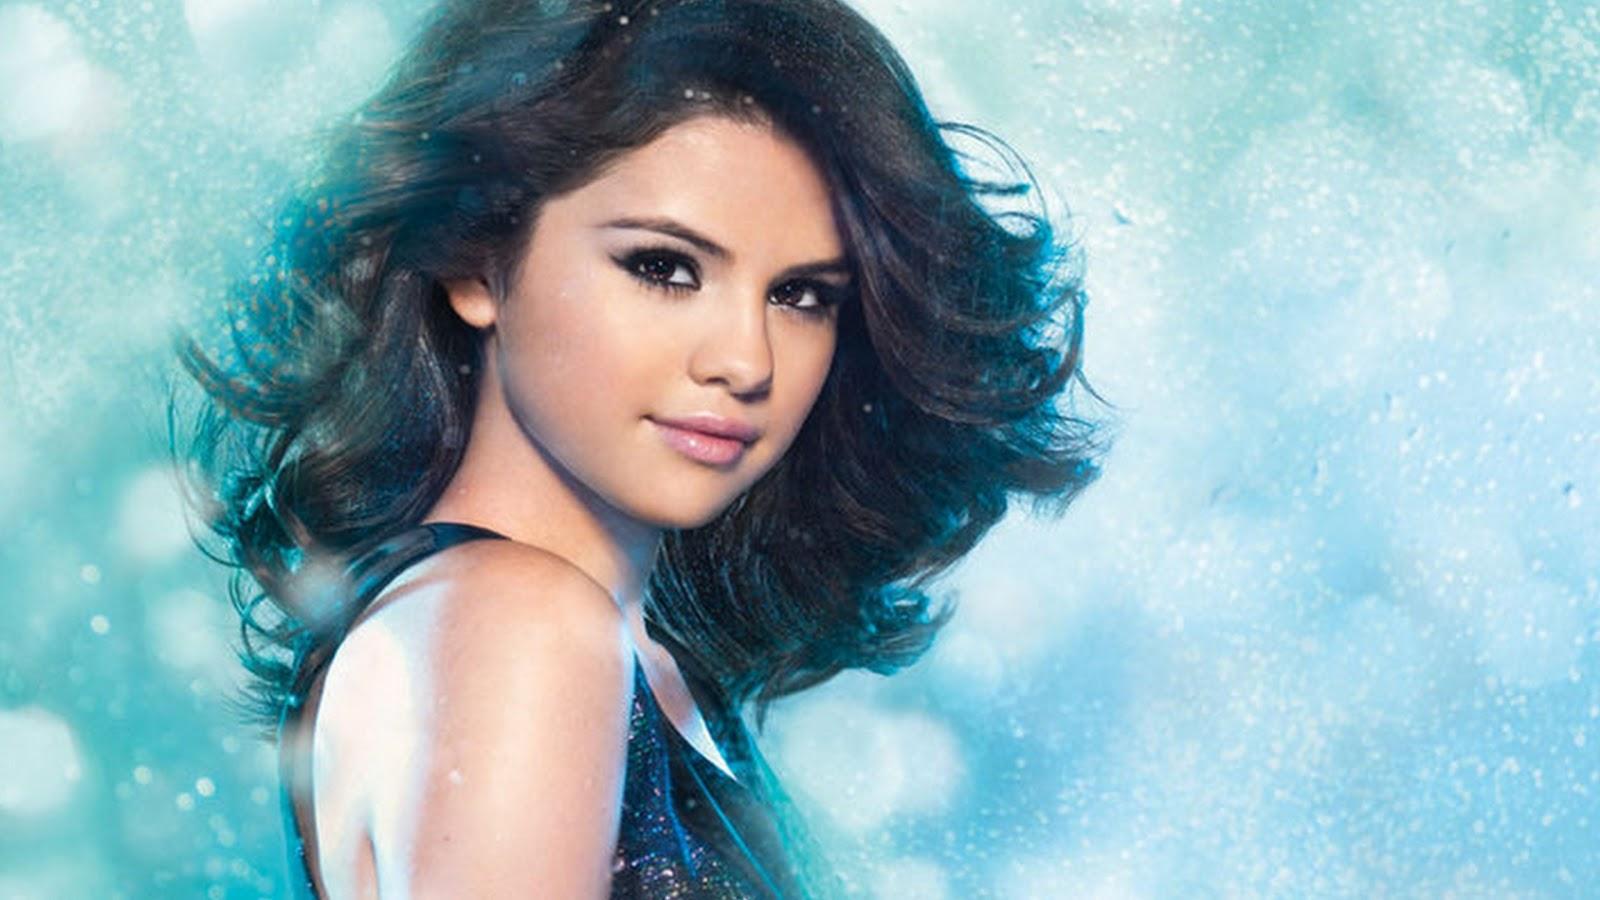 Hd Wallpapers Selena Gomez Hd Wallpapers: Killer Look Wallpapers: Selena Gomez Cool Hd Wallpapers